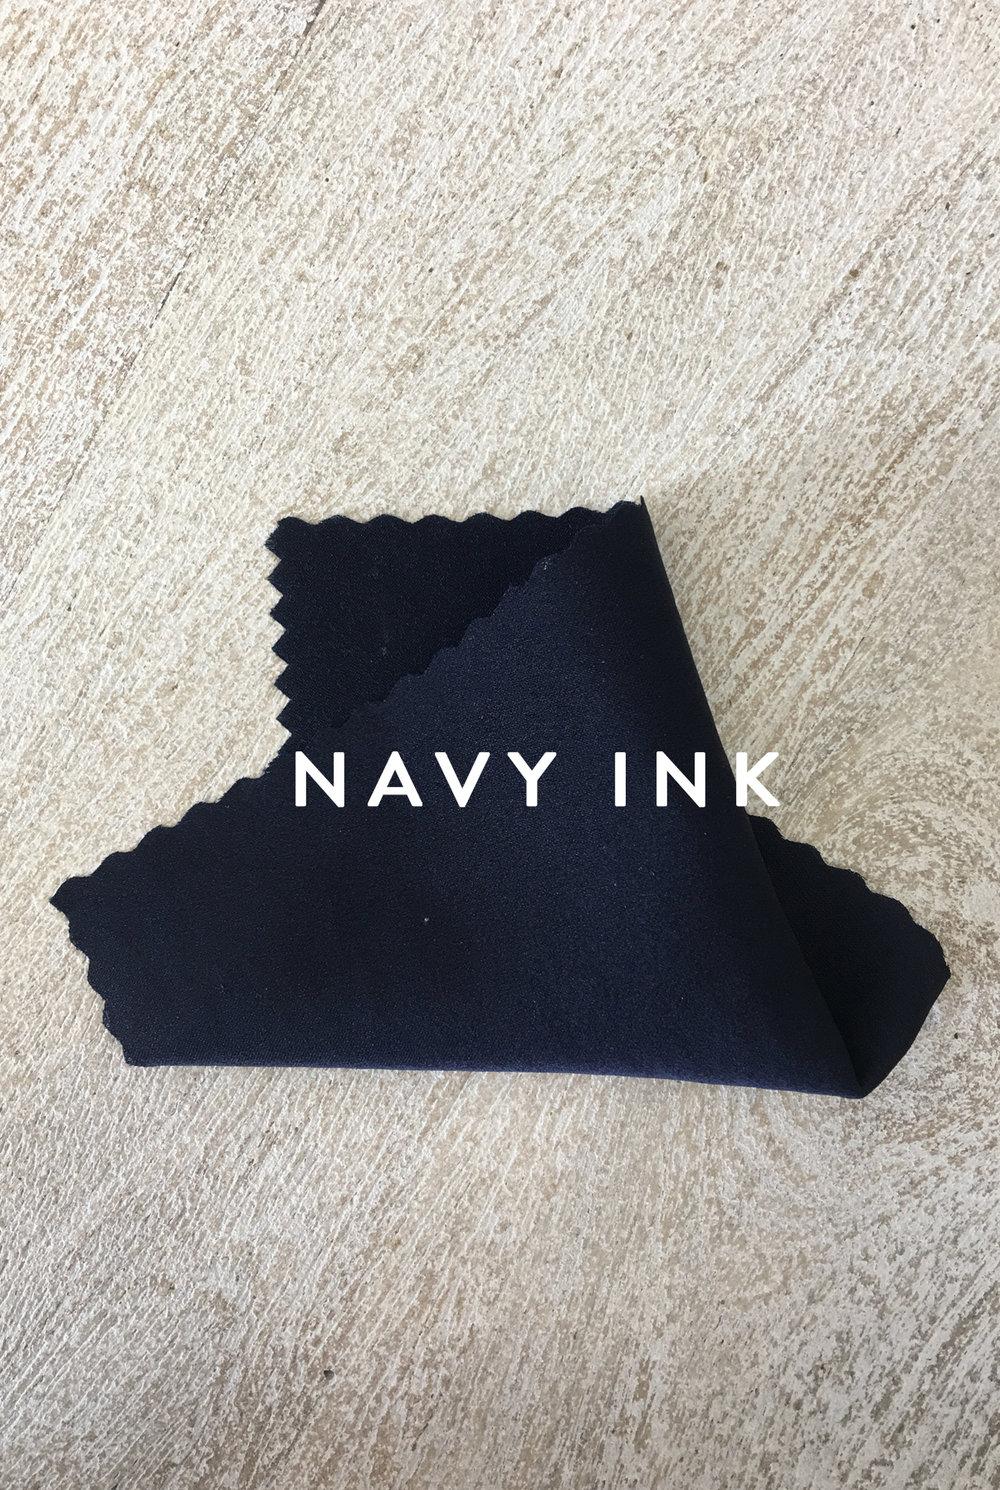 Navy Ink.jpg